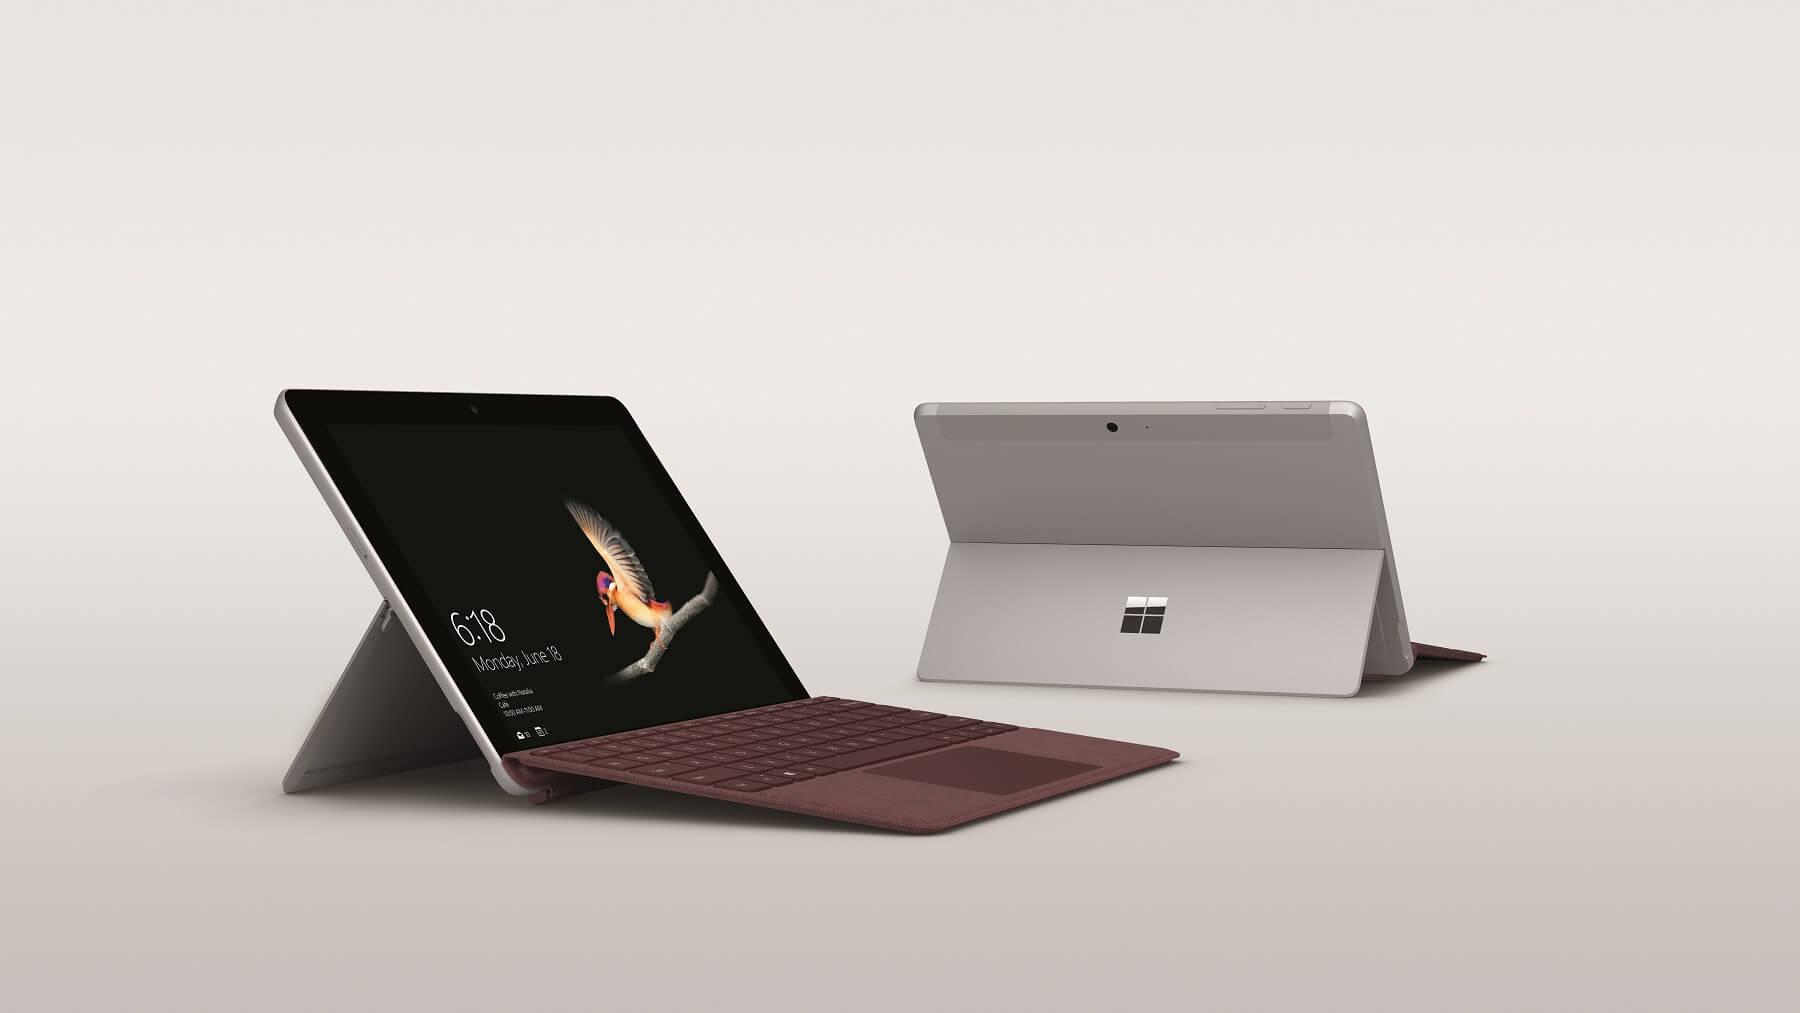 Surface Go : la contre-attaque de Microsoft face à l'iPad d'Apple